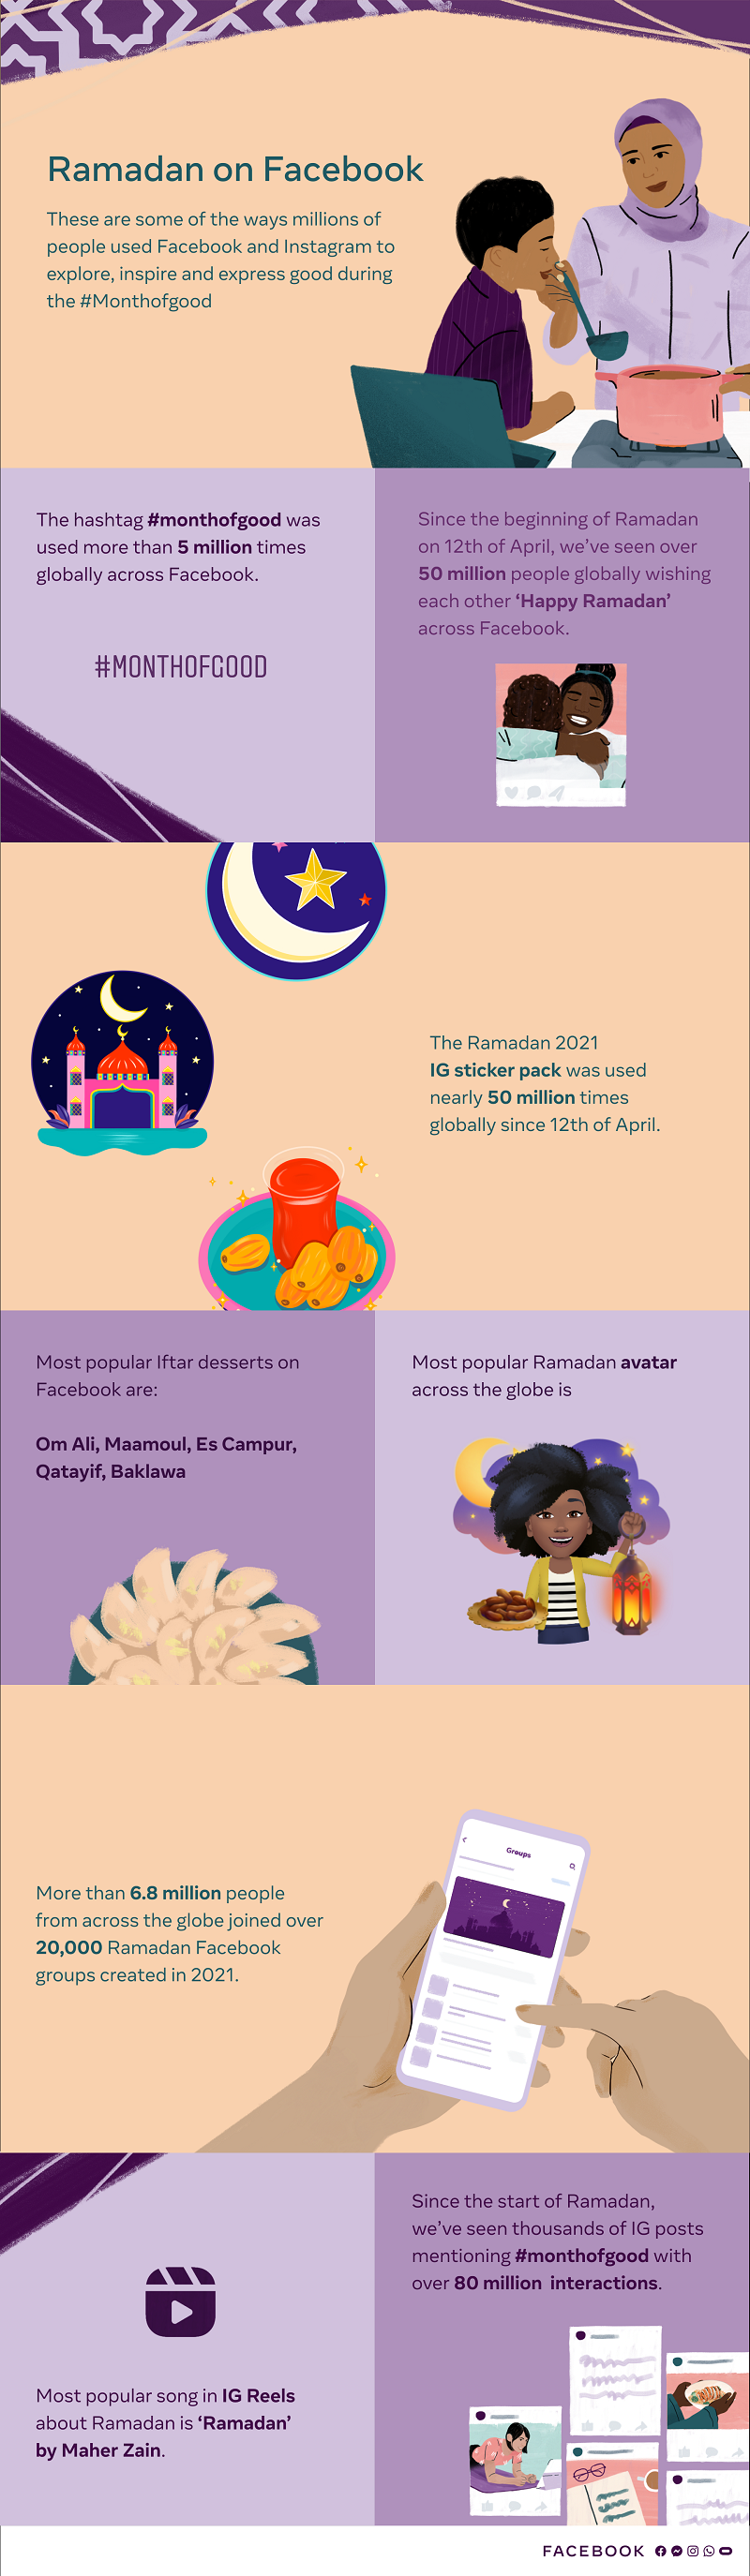 Facebook Ramadan trends